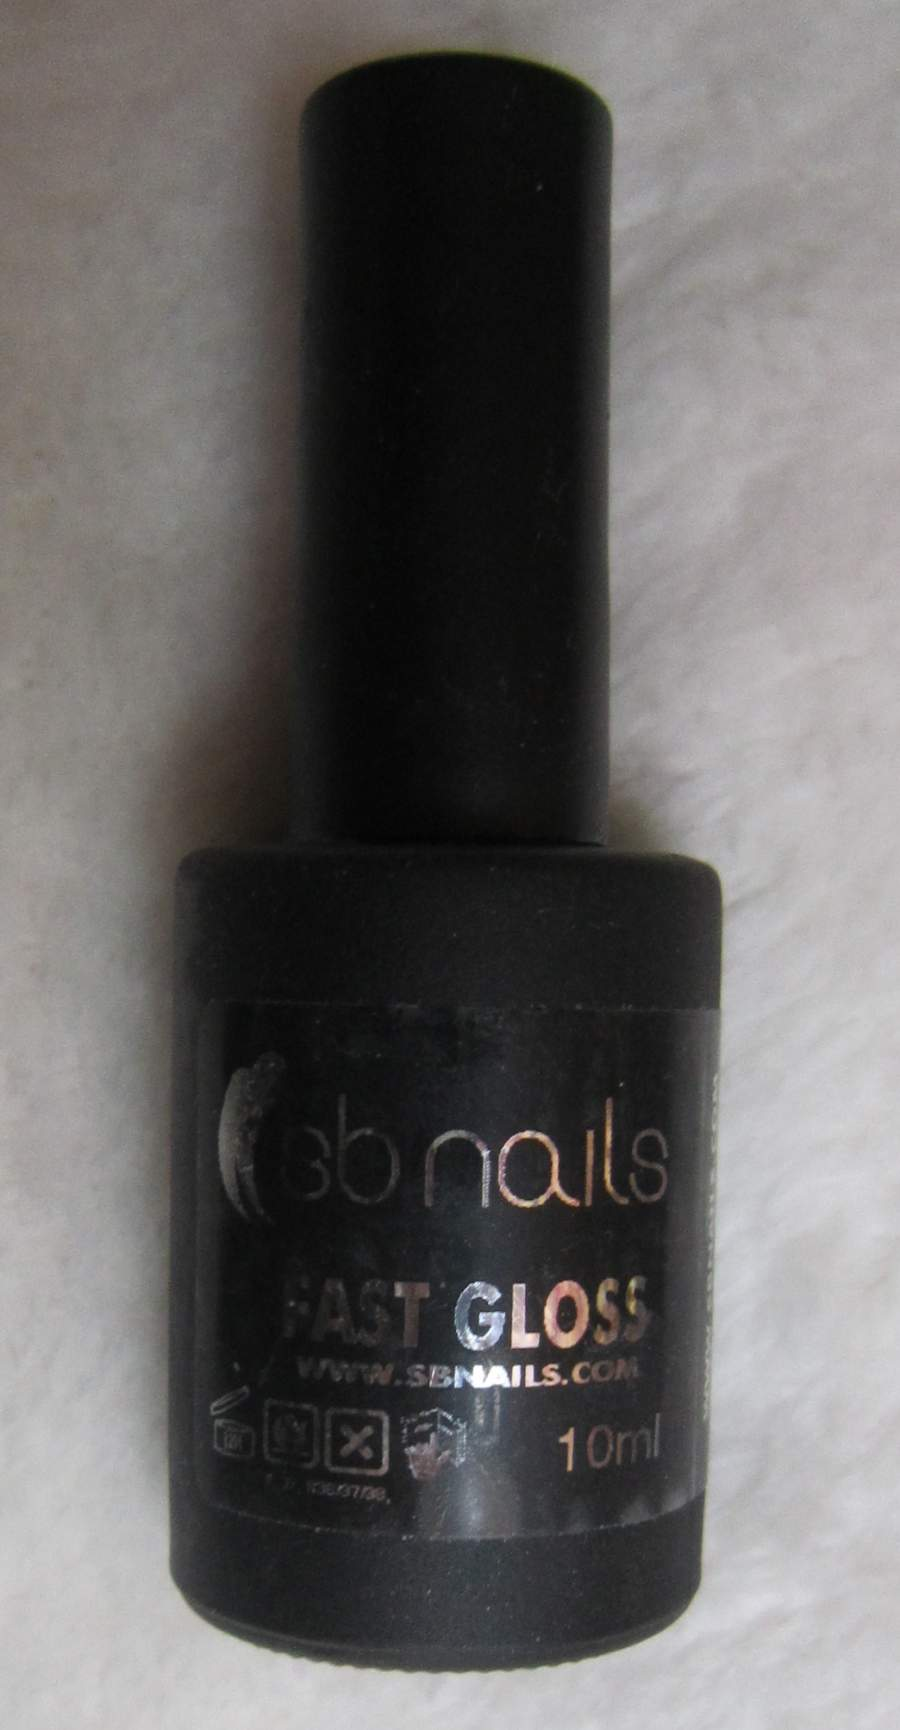 Sb Nails Fast Gloss - Top Coat